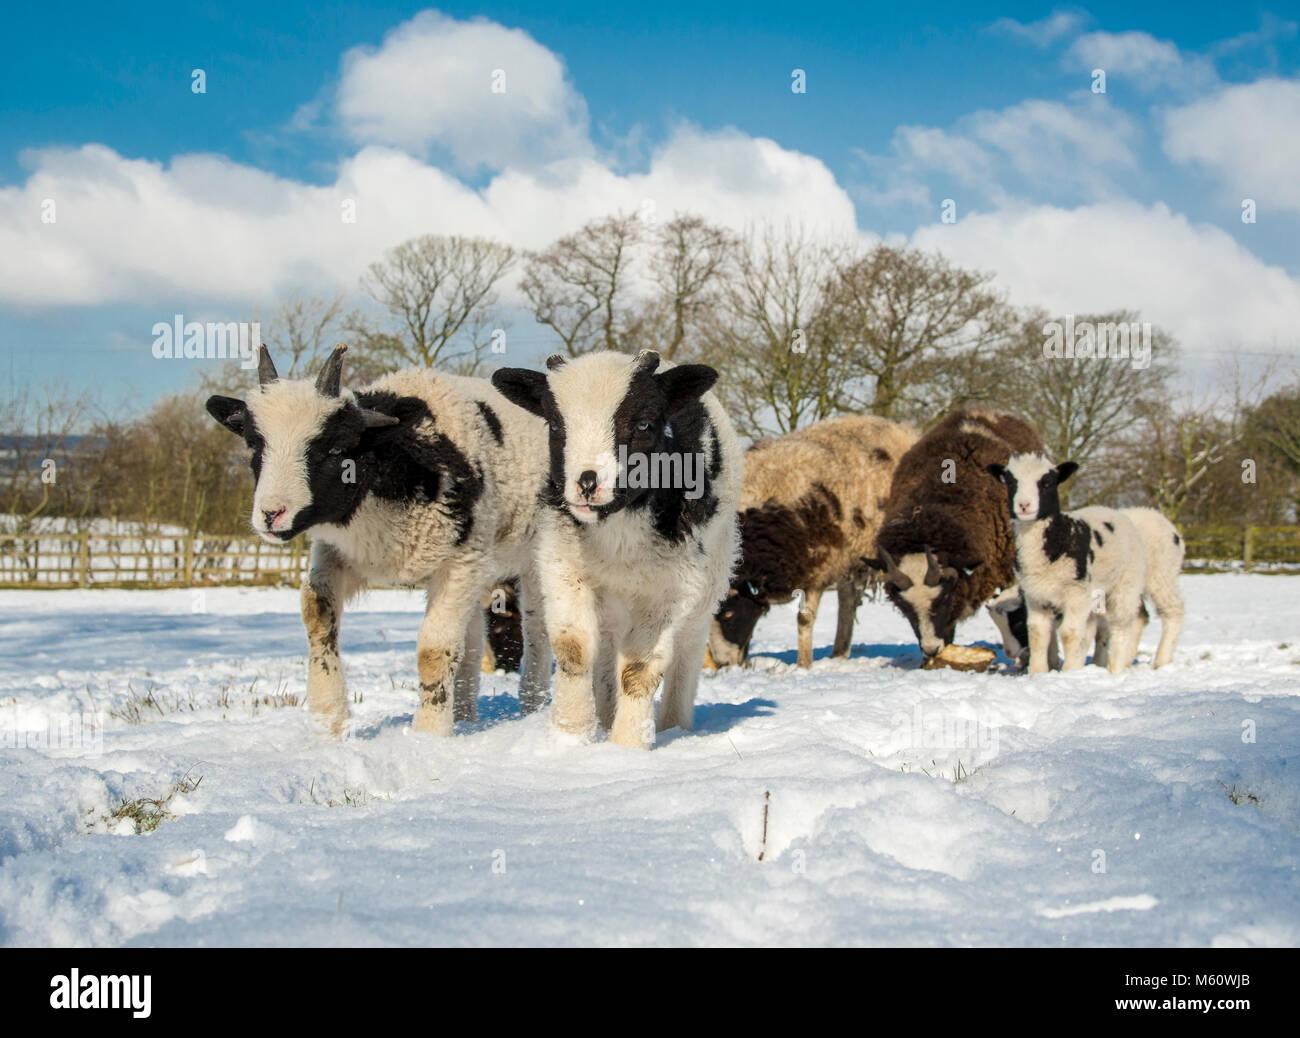 Preston, Lancashire, UK. 27th Feb, 2018.  Credit: John Eveson/Alamy Live News.  Preston, Lancashire, UK. 27th Feb, - Stock Image